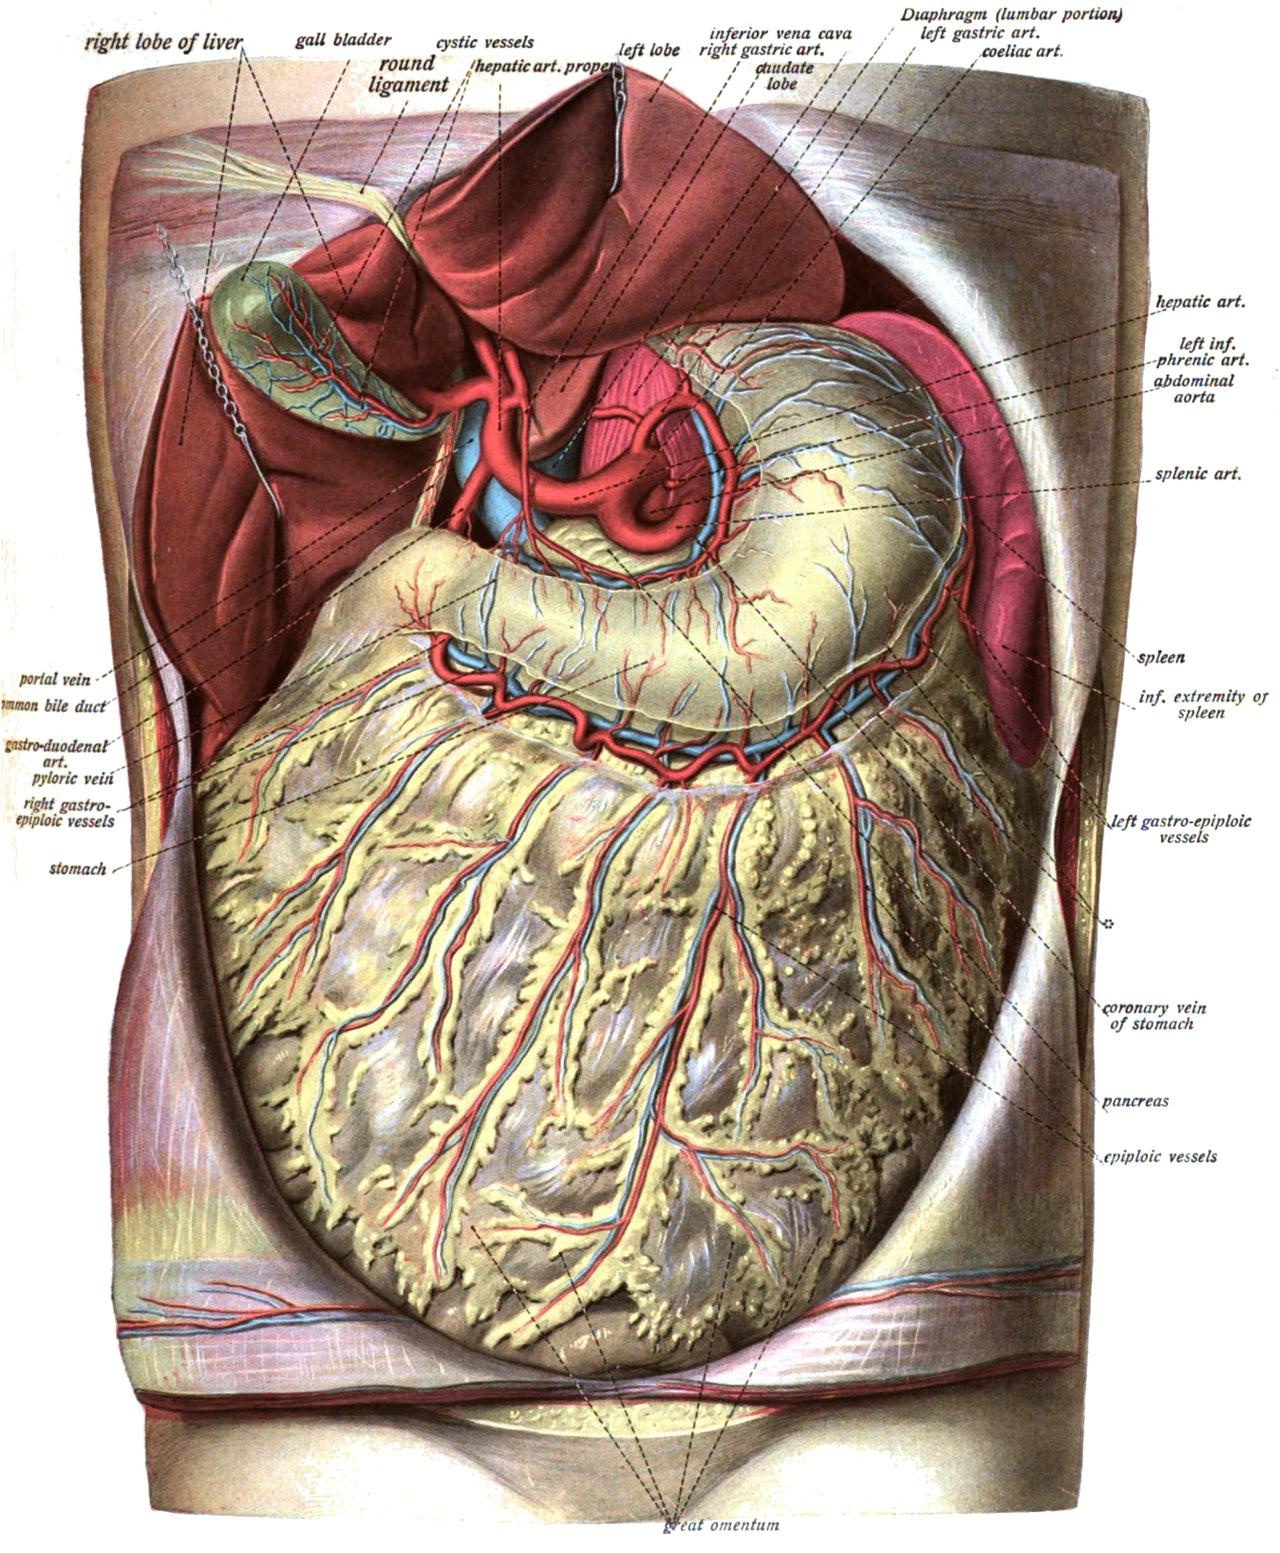 apron omentum fat body immune system